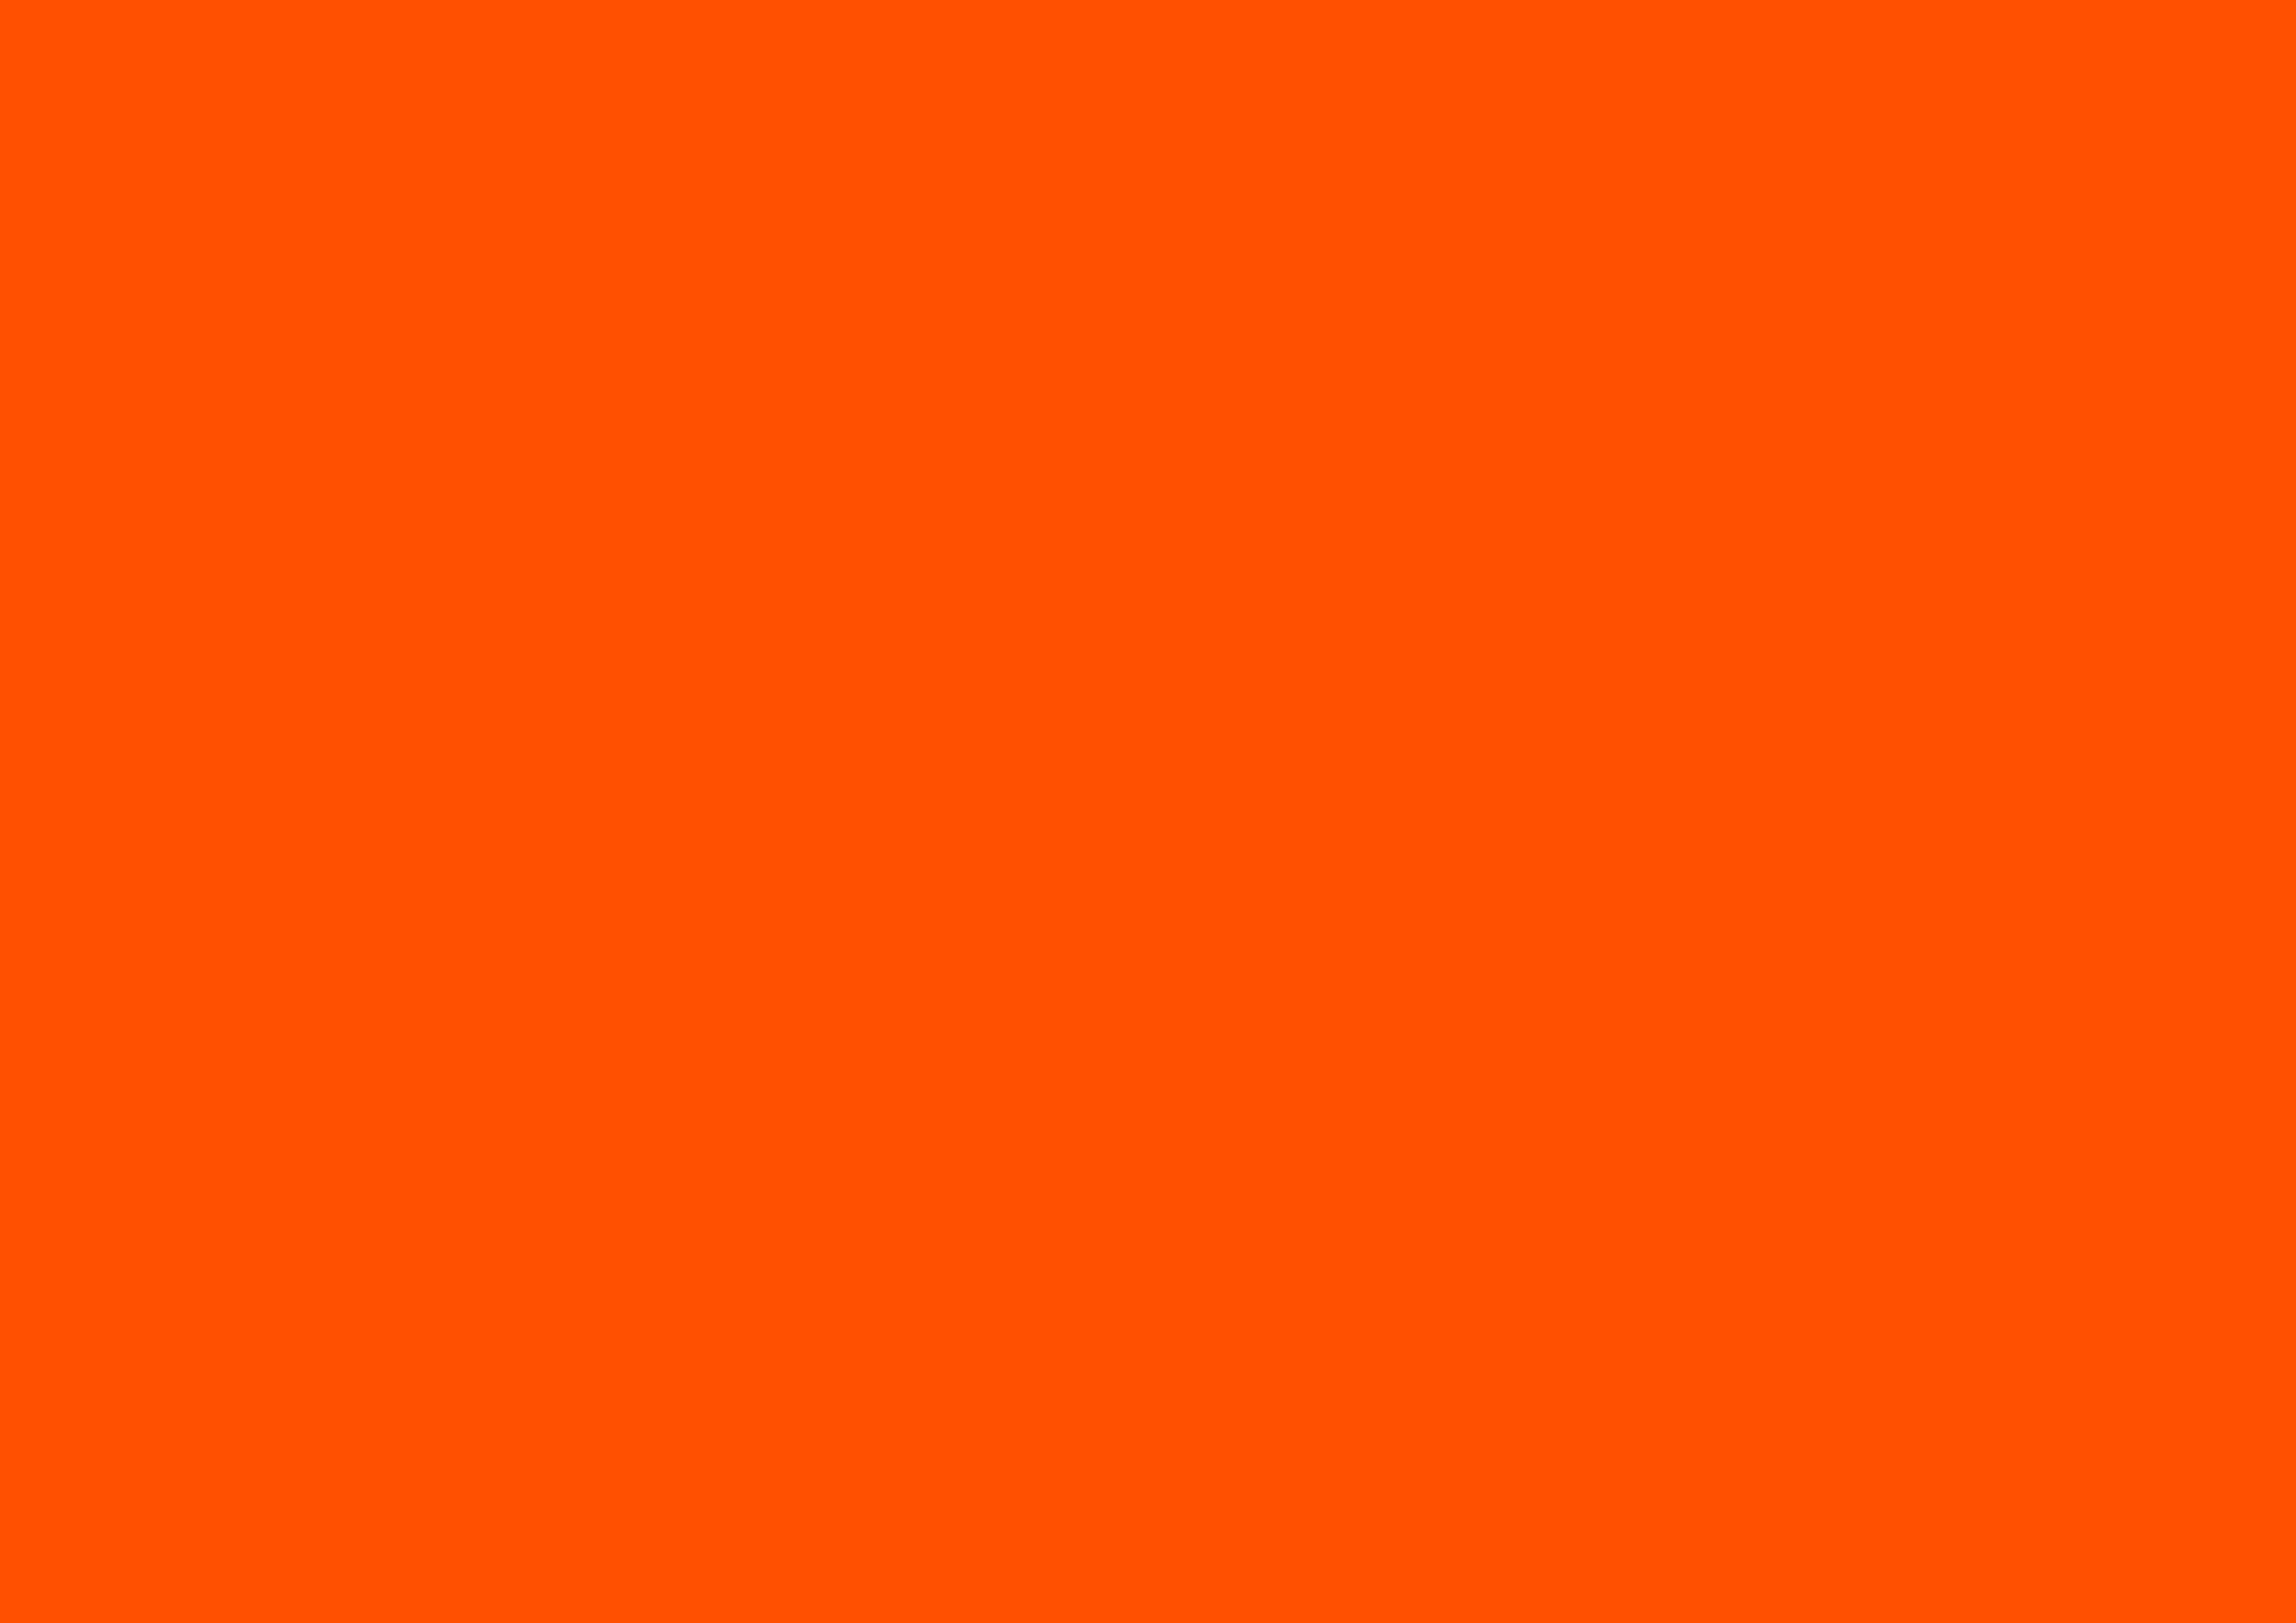 3508x2480 International Orange Aerospace Solid Color Background